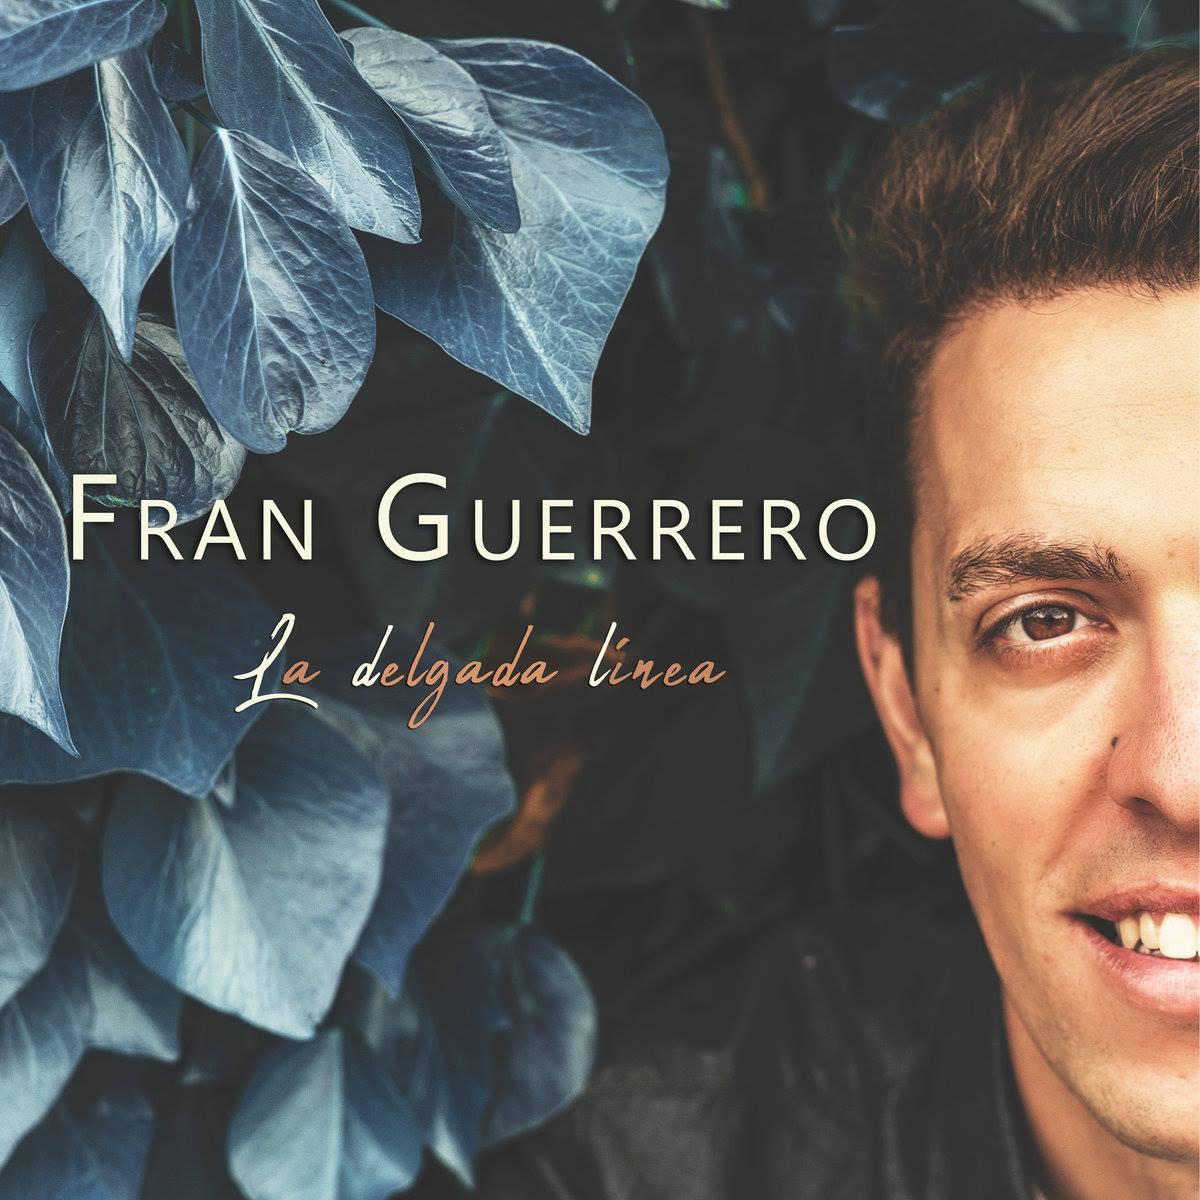 Fran Guerrero Music